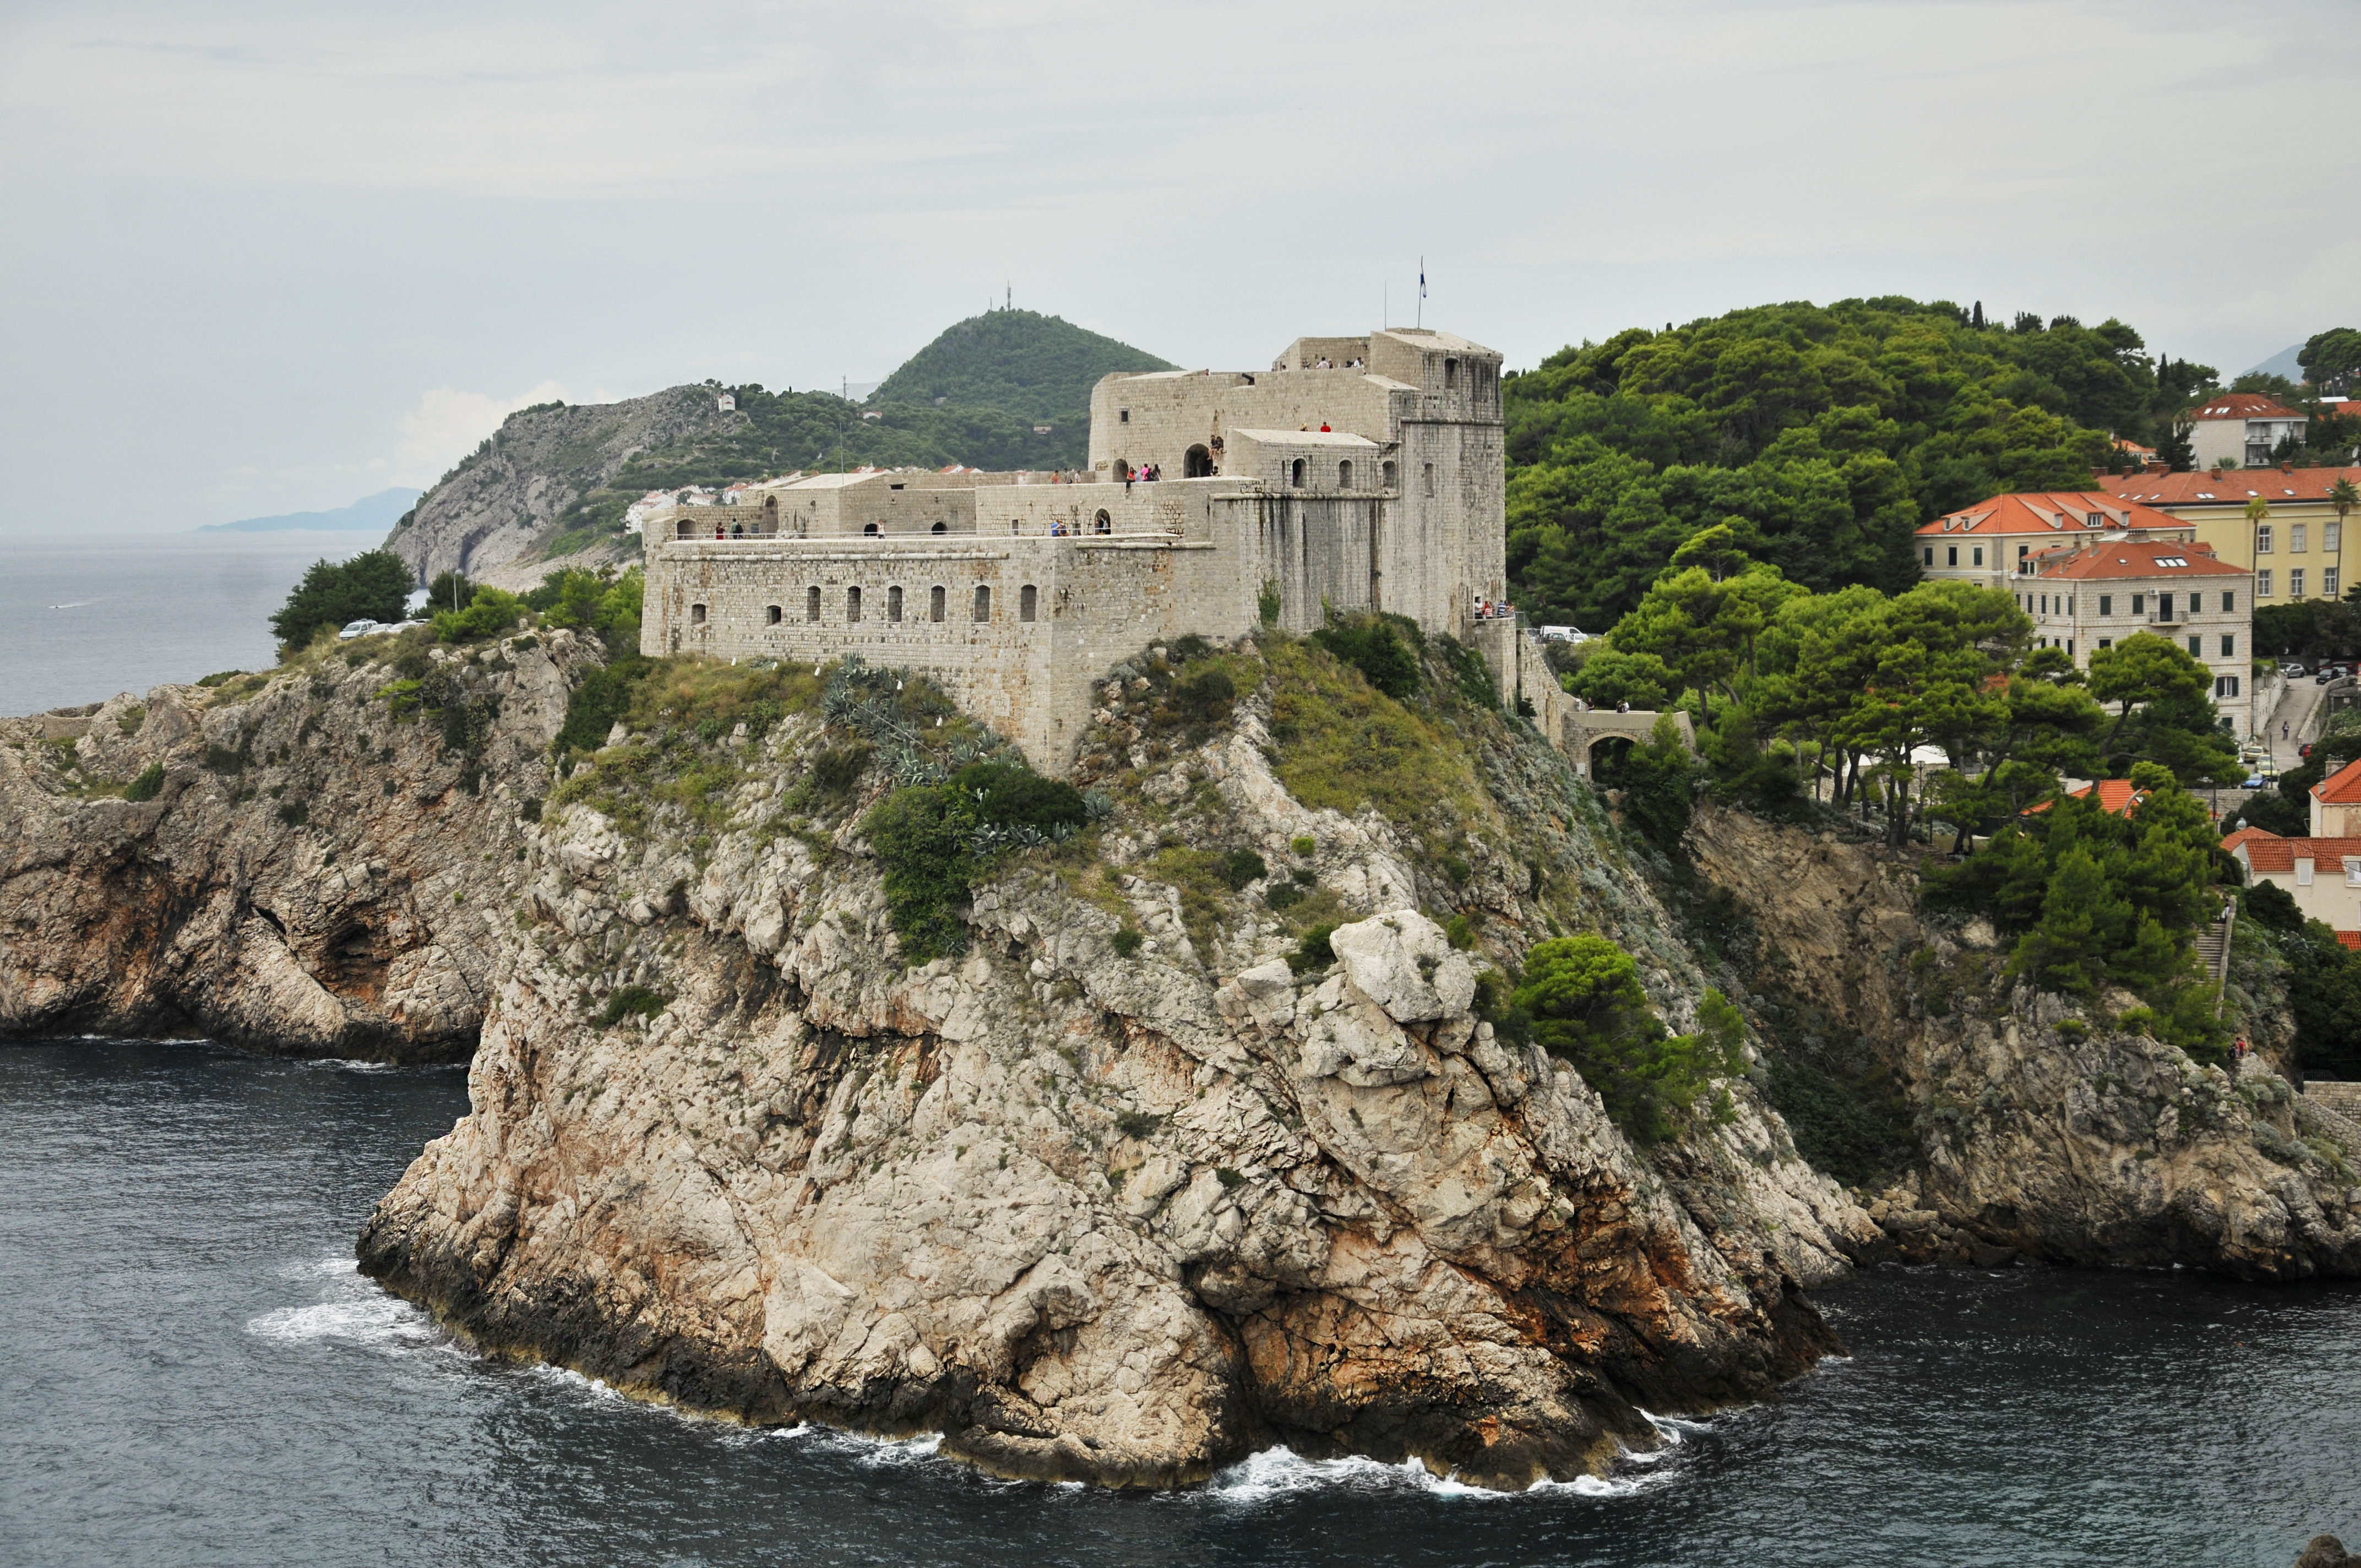 Dubrovnik, escenario de rodaje de Juego de Tronos - Croacia Circuito Gran tour de Croacia e Istria